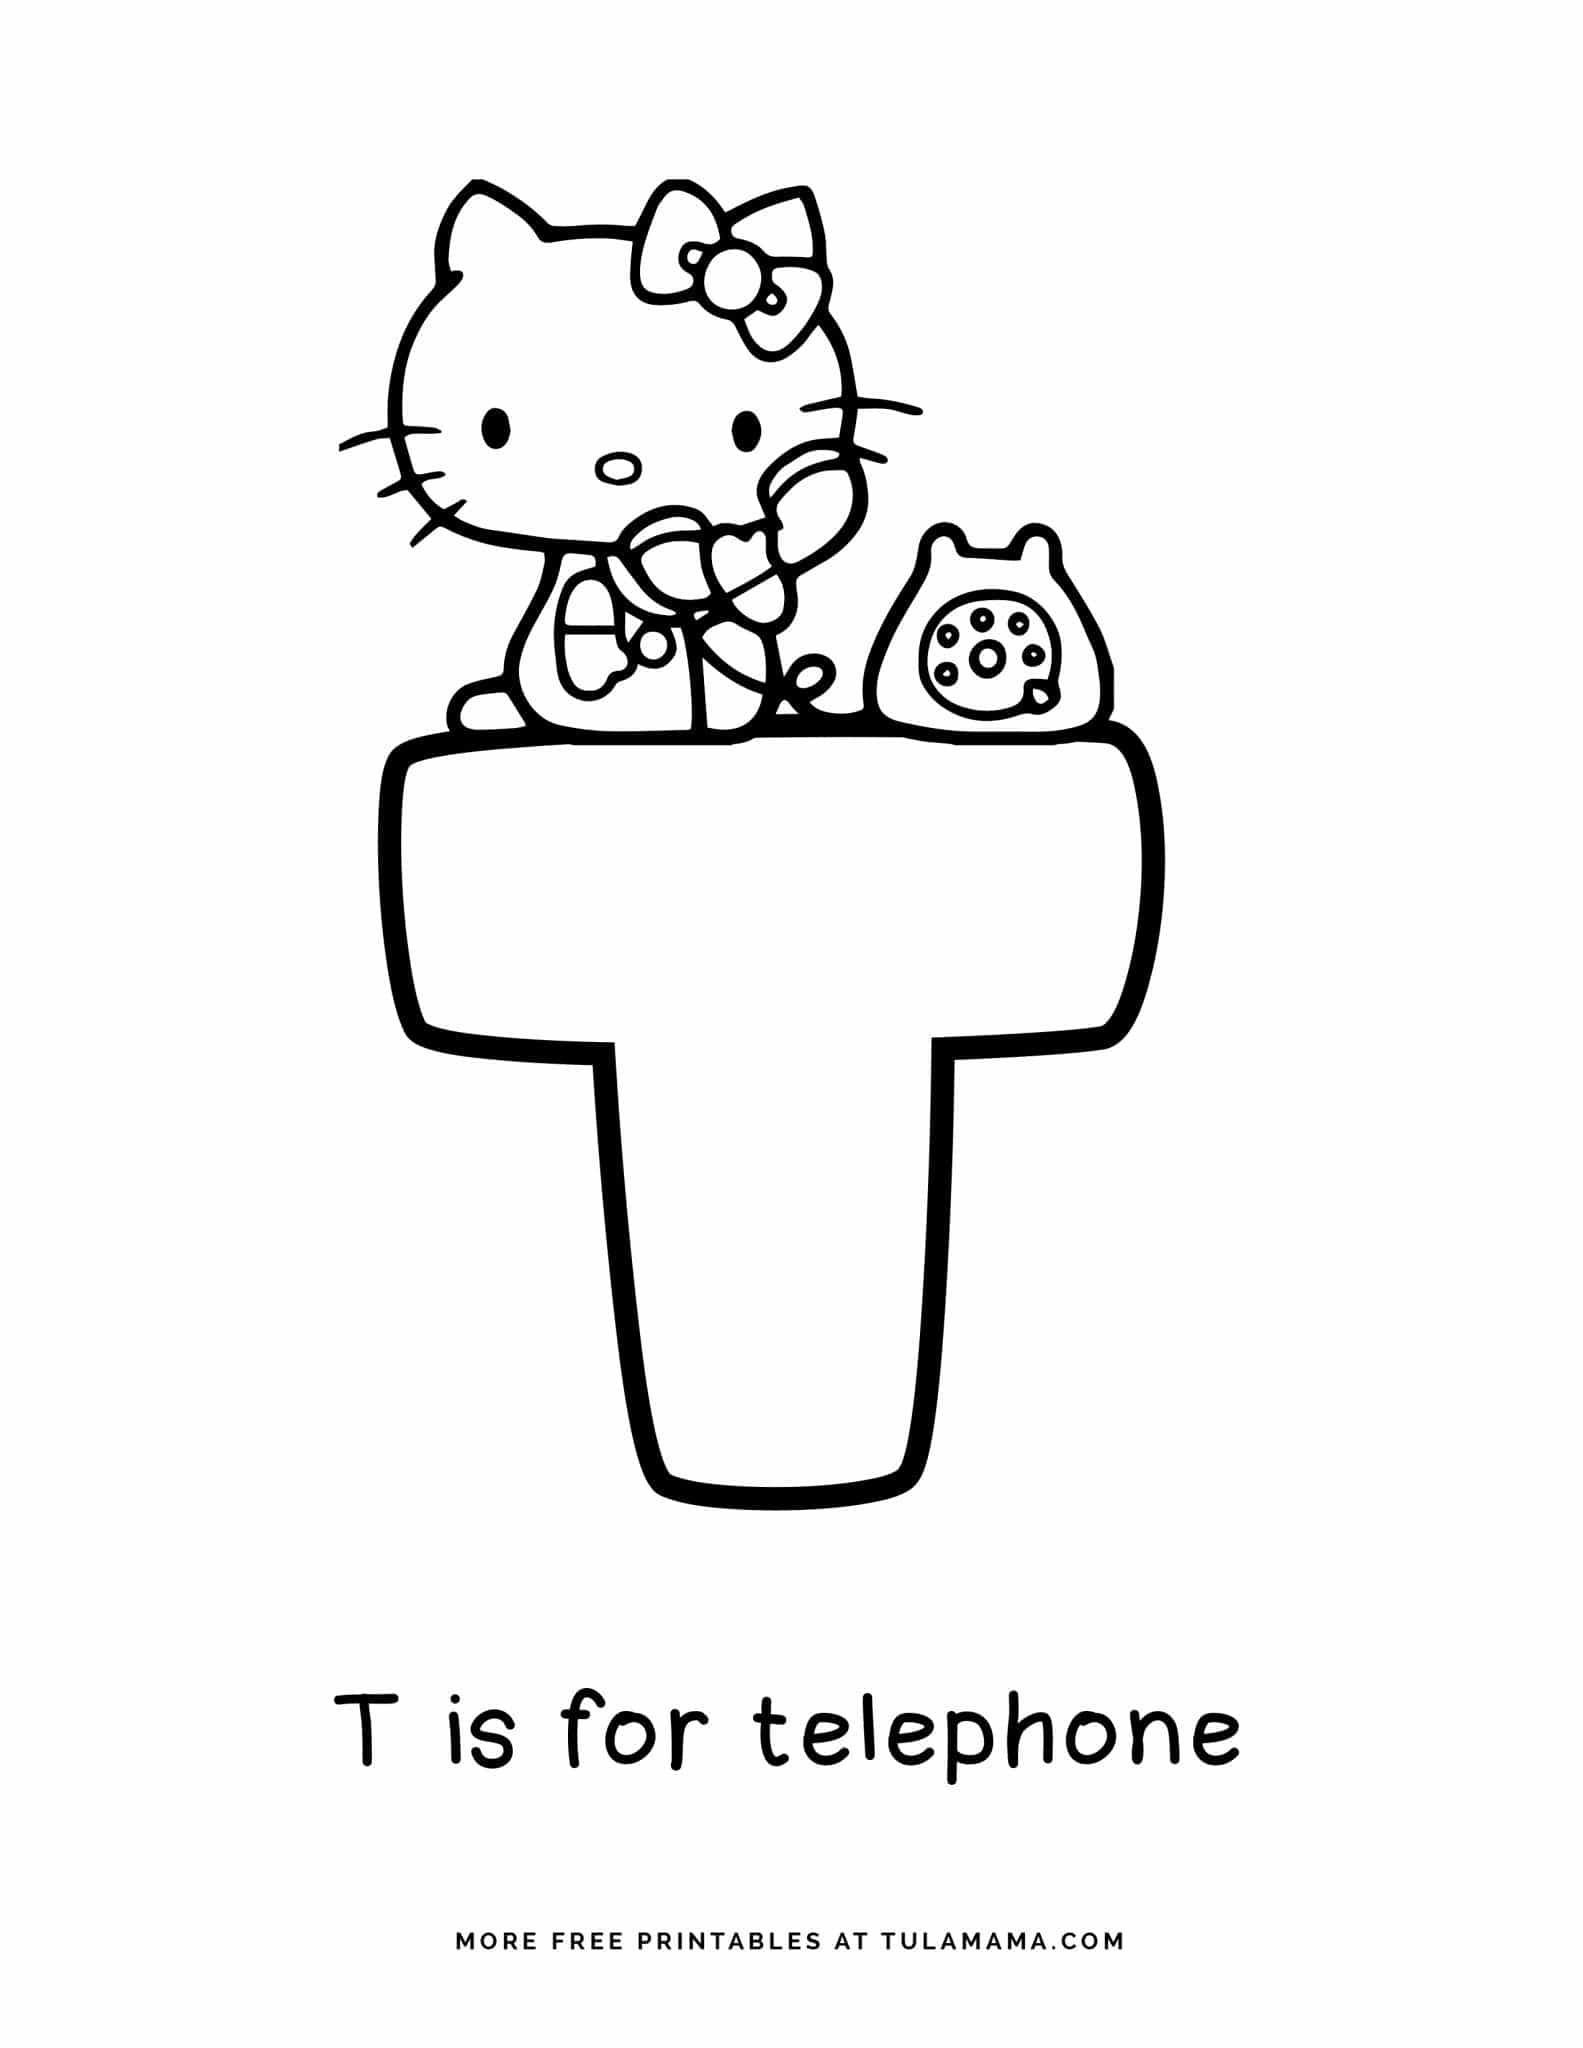 Free Hello Kitty Printables And Abc Coloring Pages In 2021 Abc Coloring Pages Abc Coloring Hello Kitty Printables